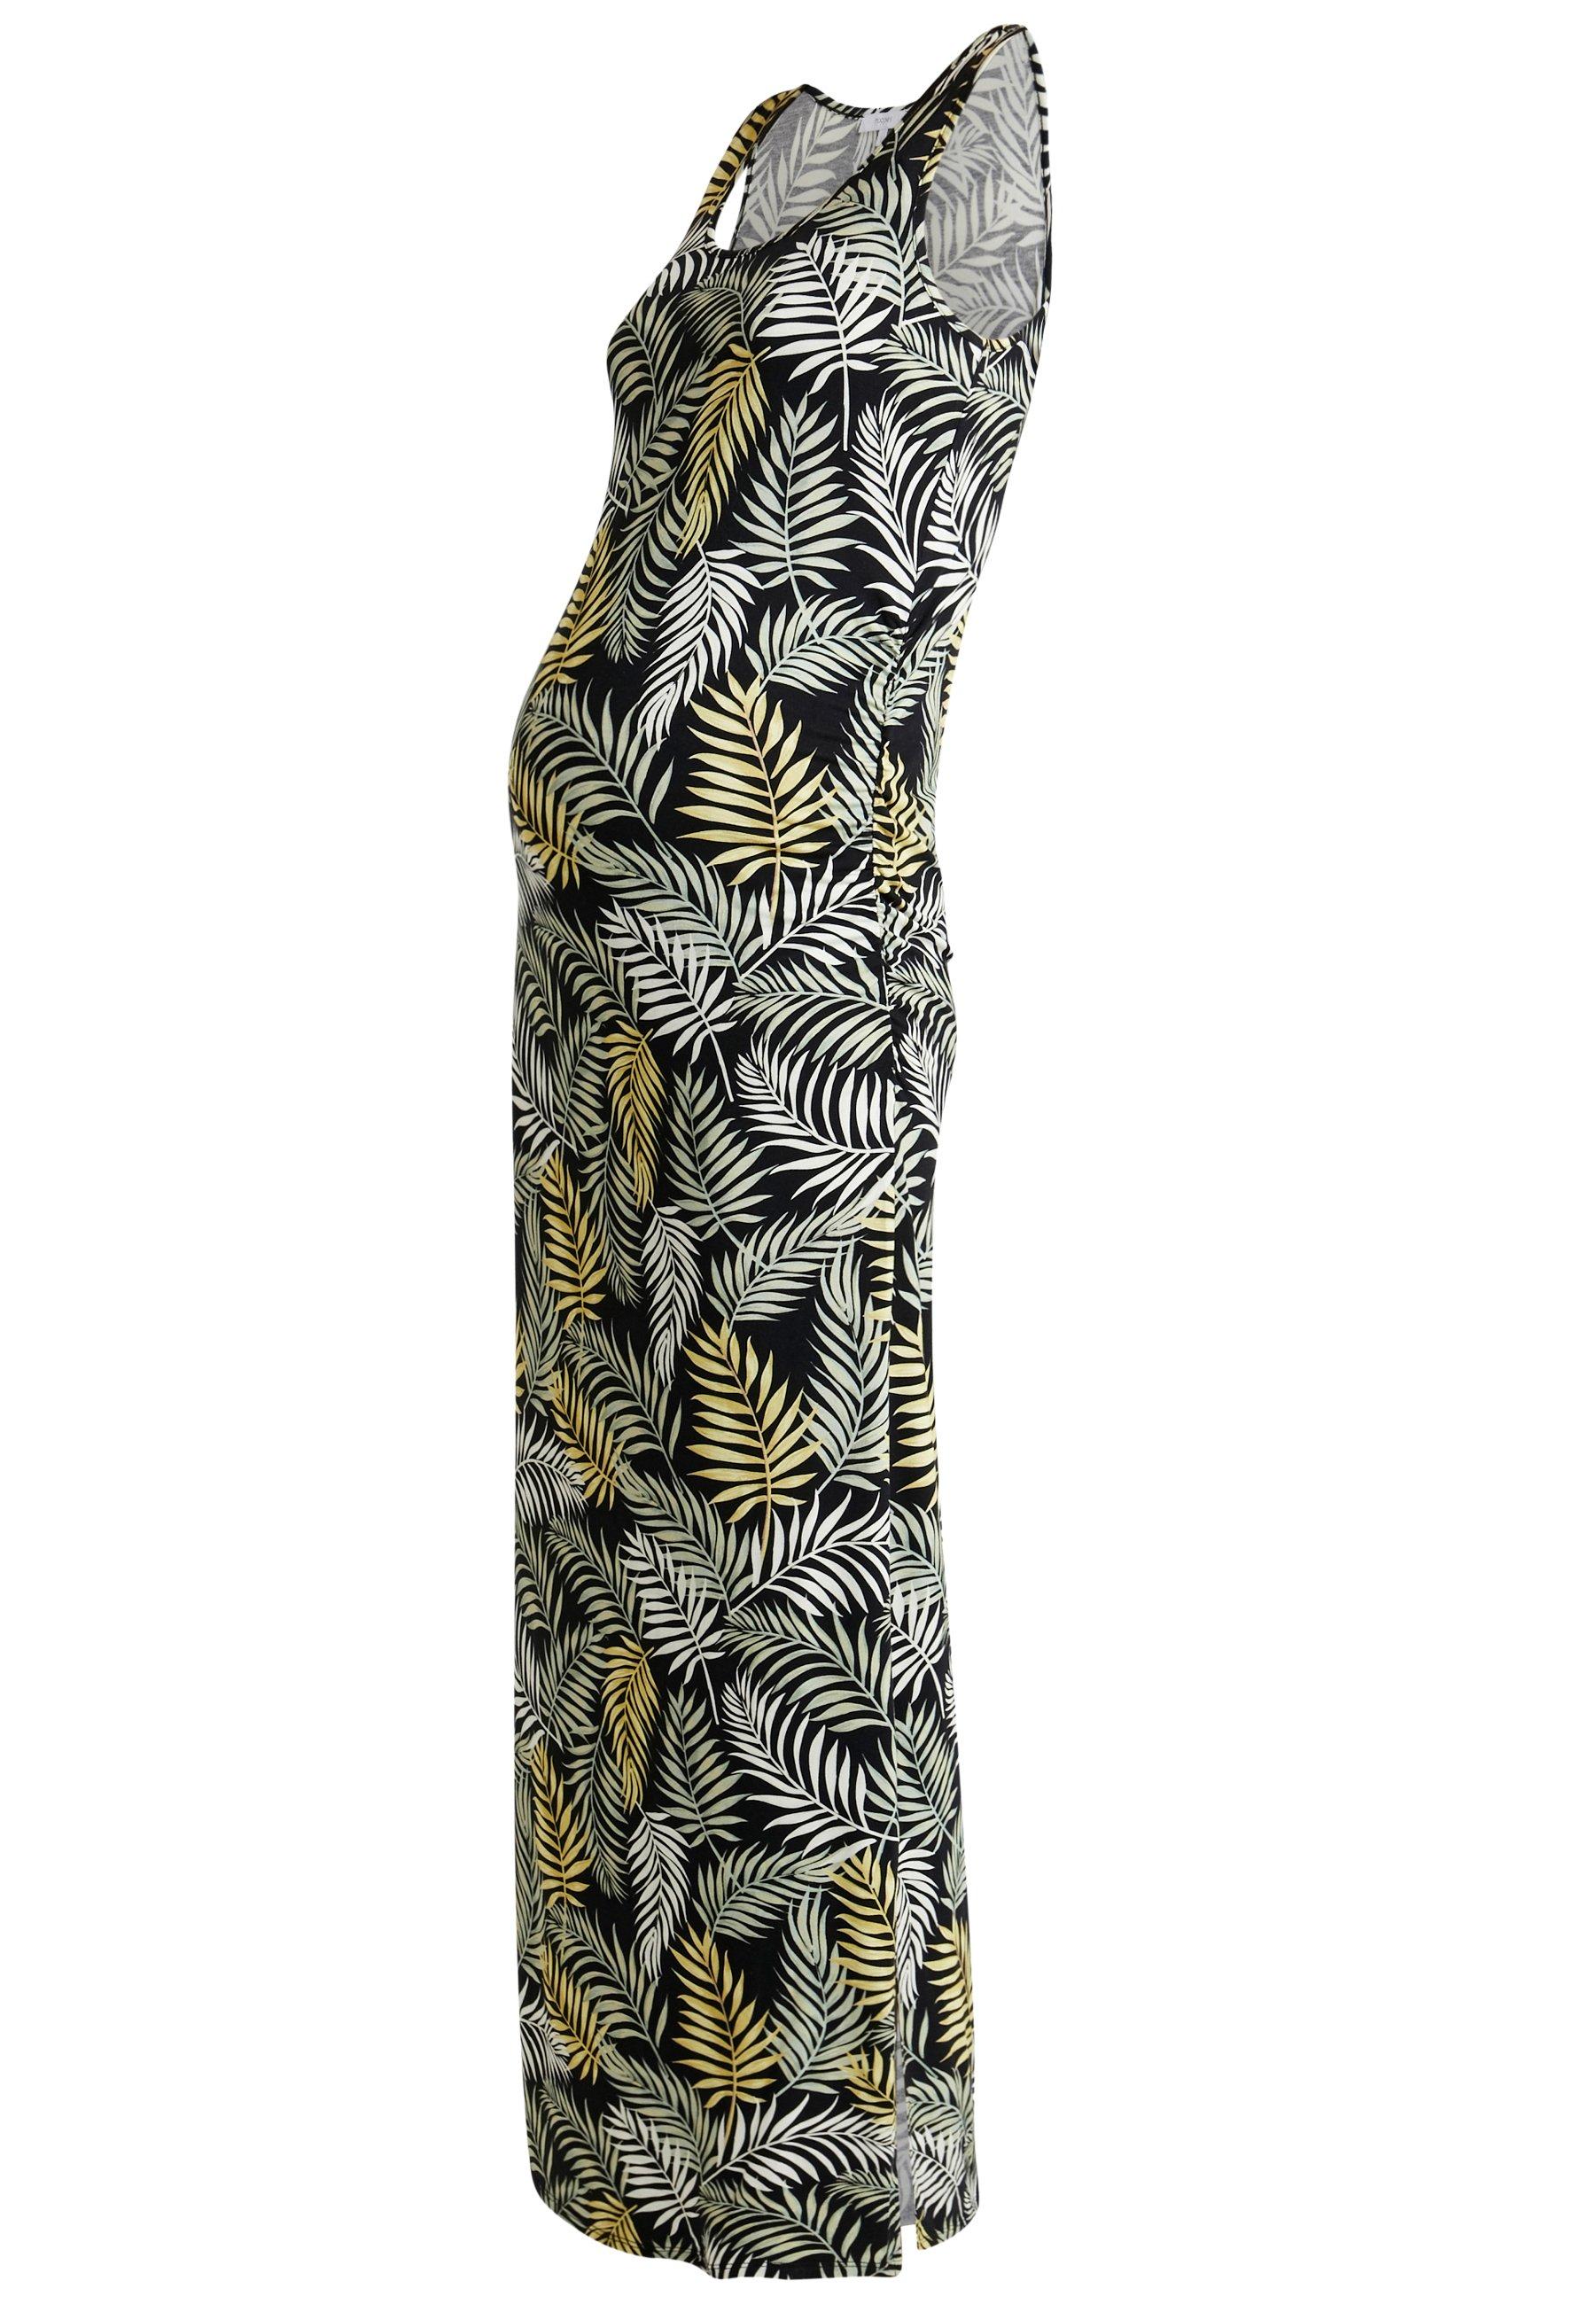 Noppies Dress - Maxiklänning Black